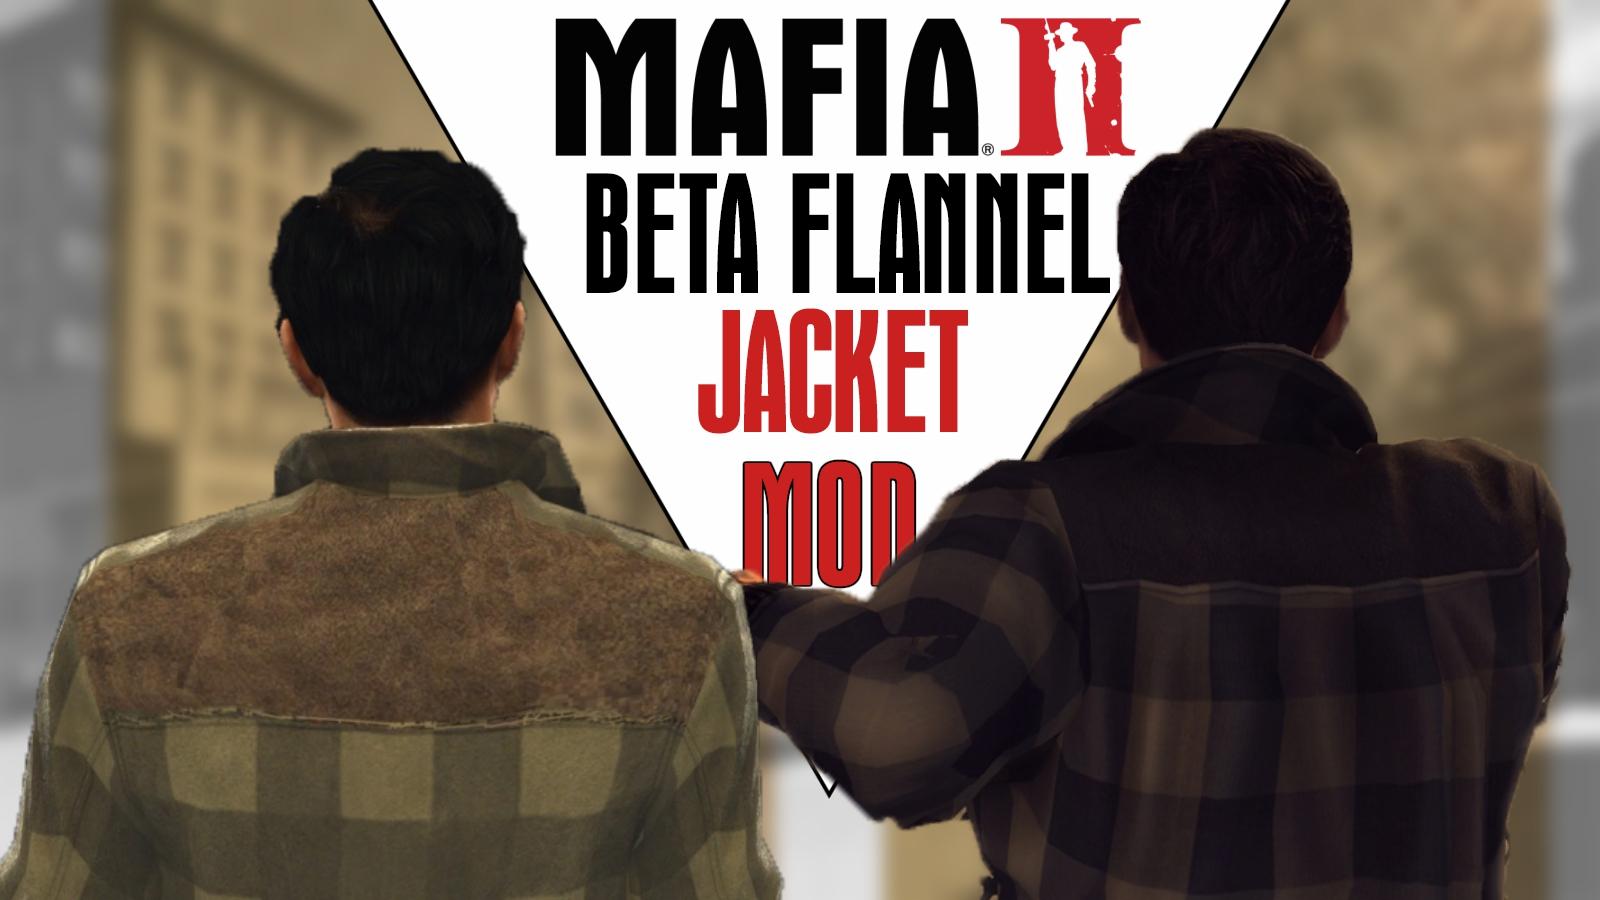 MAFIA II – BETA FLANNEL JACKET MOD